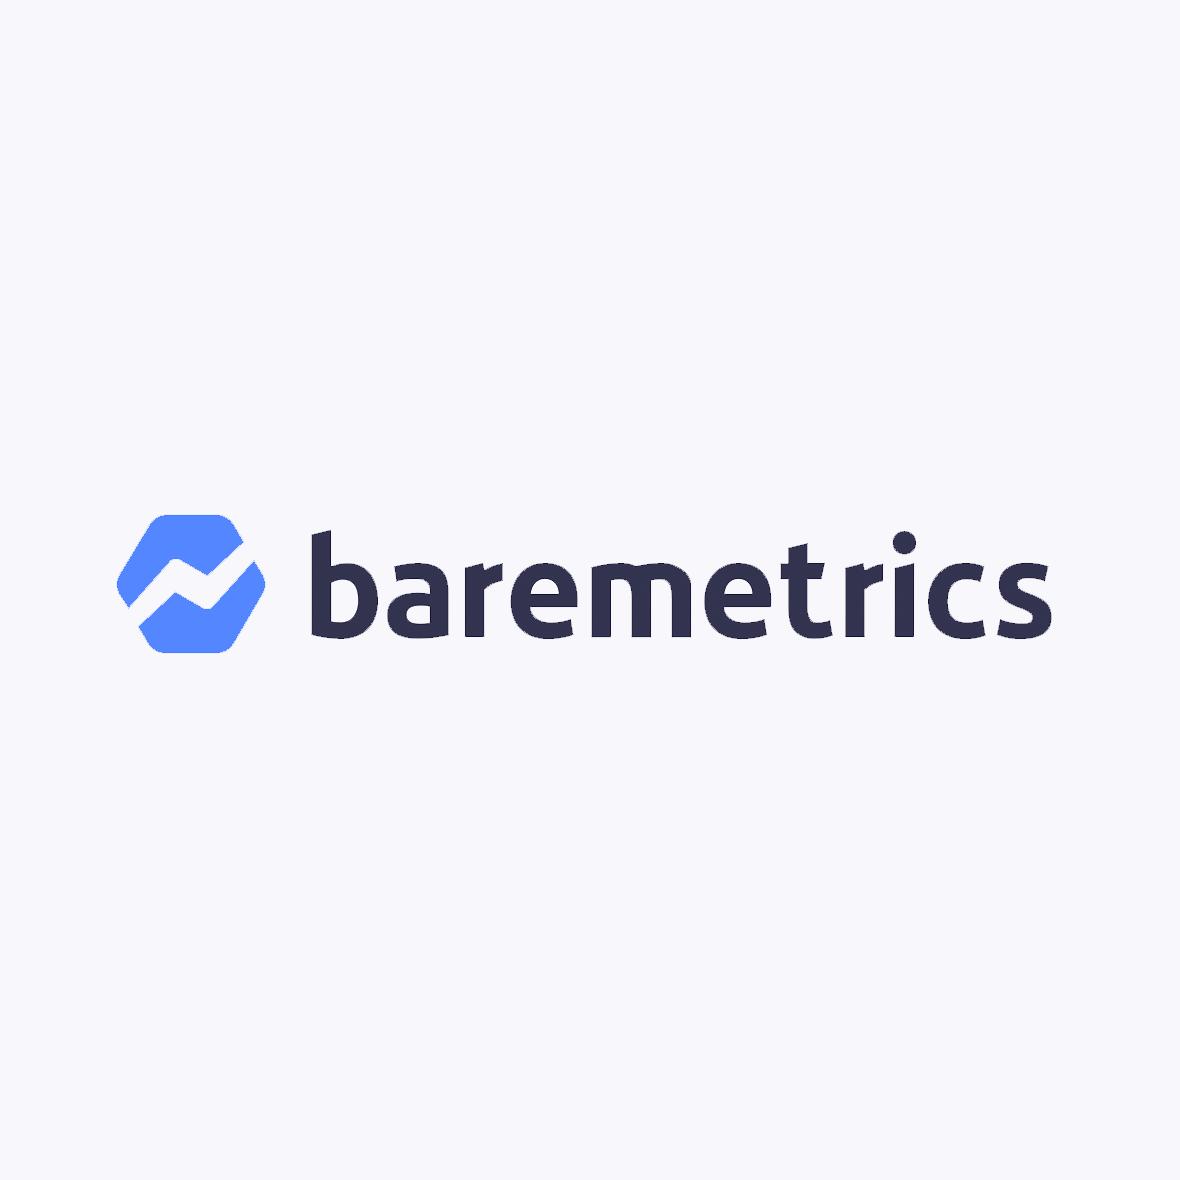 Baremetrics